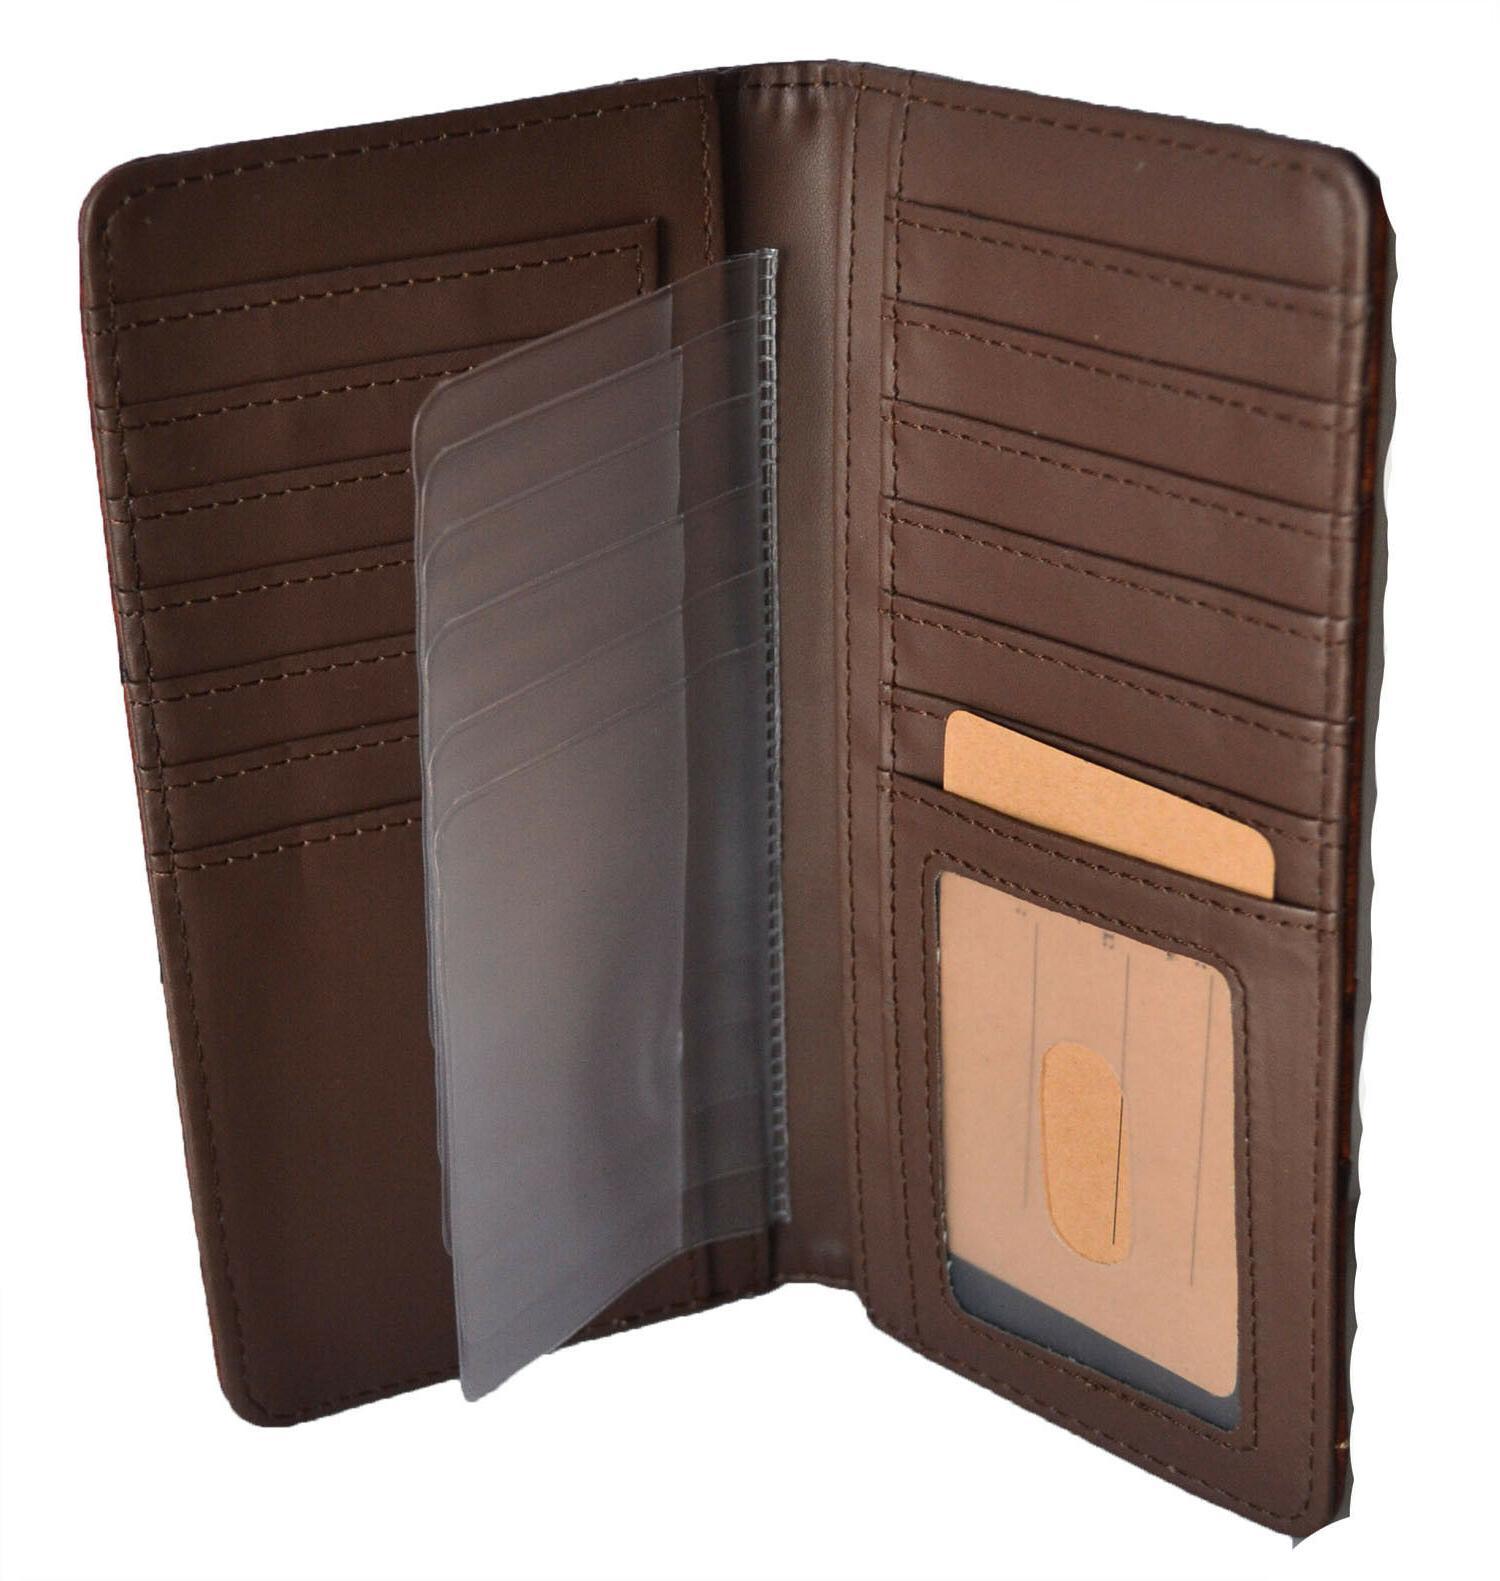 Western wallets for mens Horse State Long Bi-fold Wallet Brown